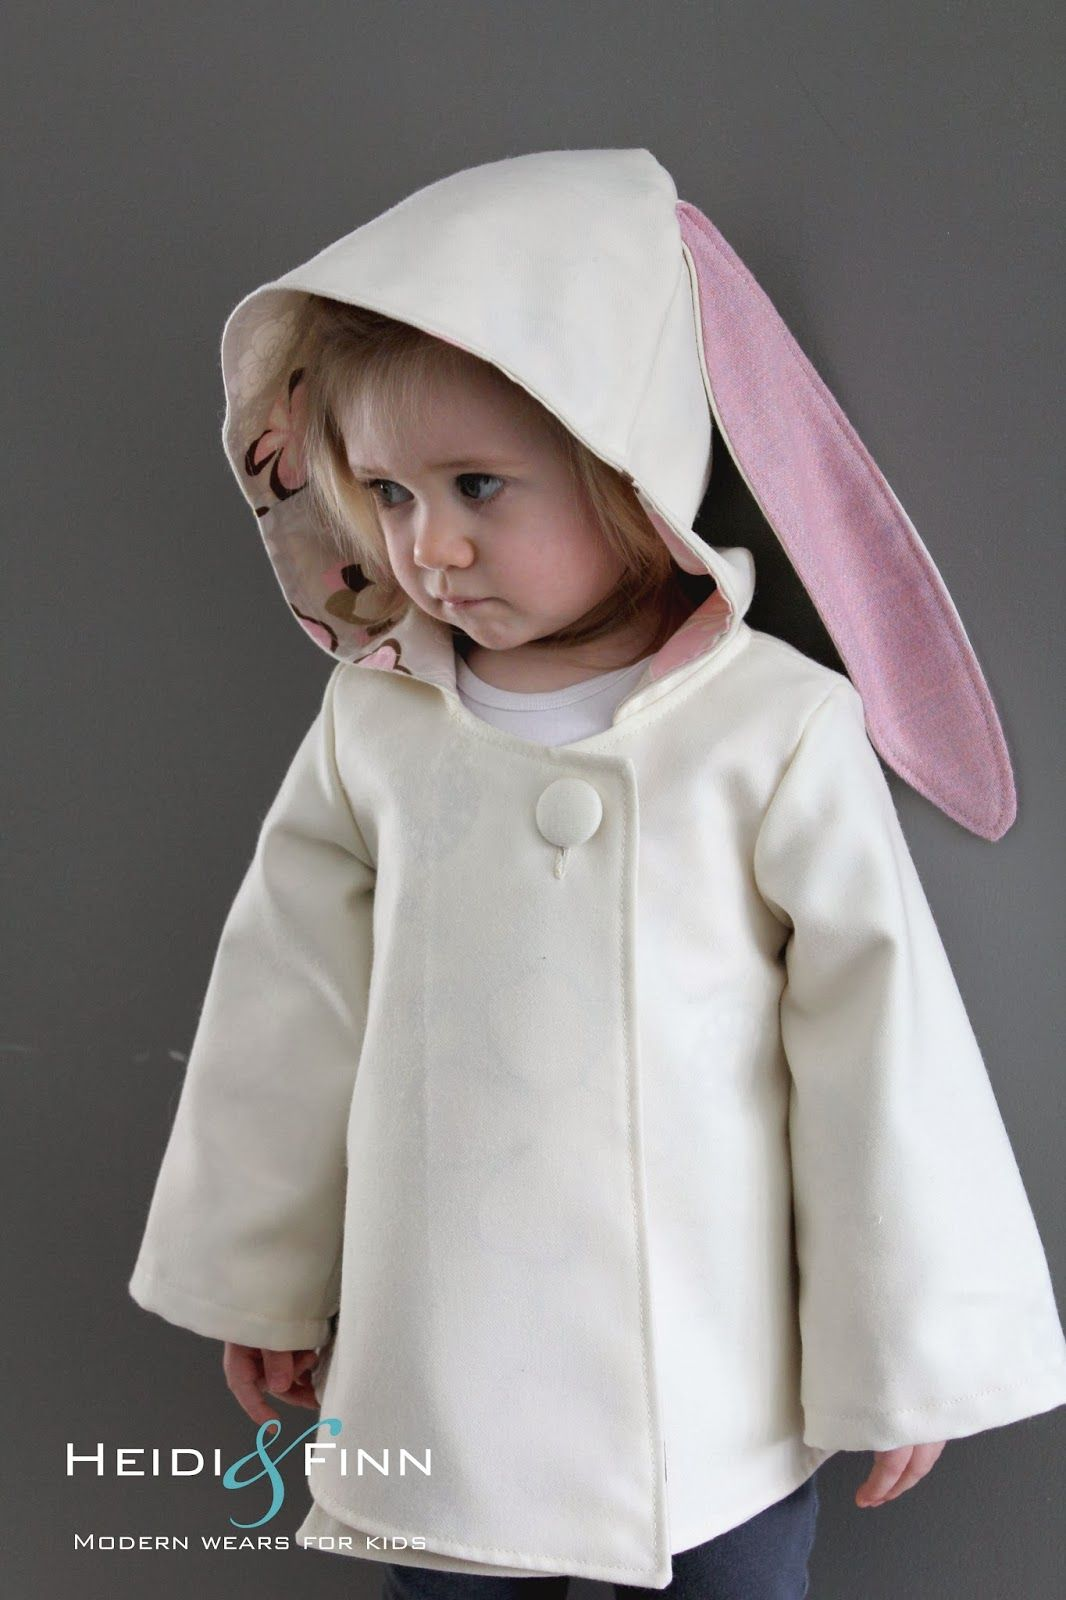 HeidiandFinn modern wears for kids: New Release -The NEW chic ...